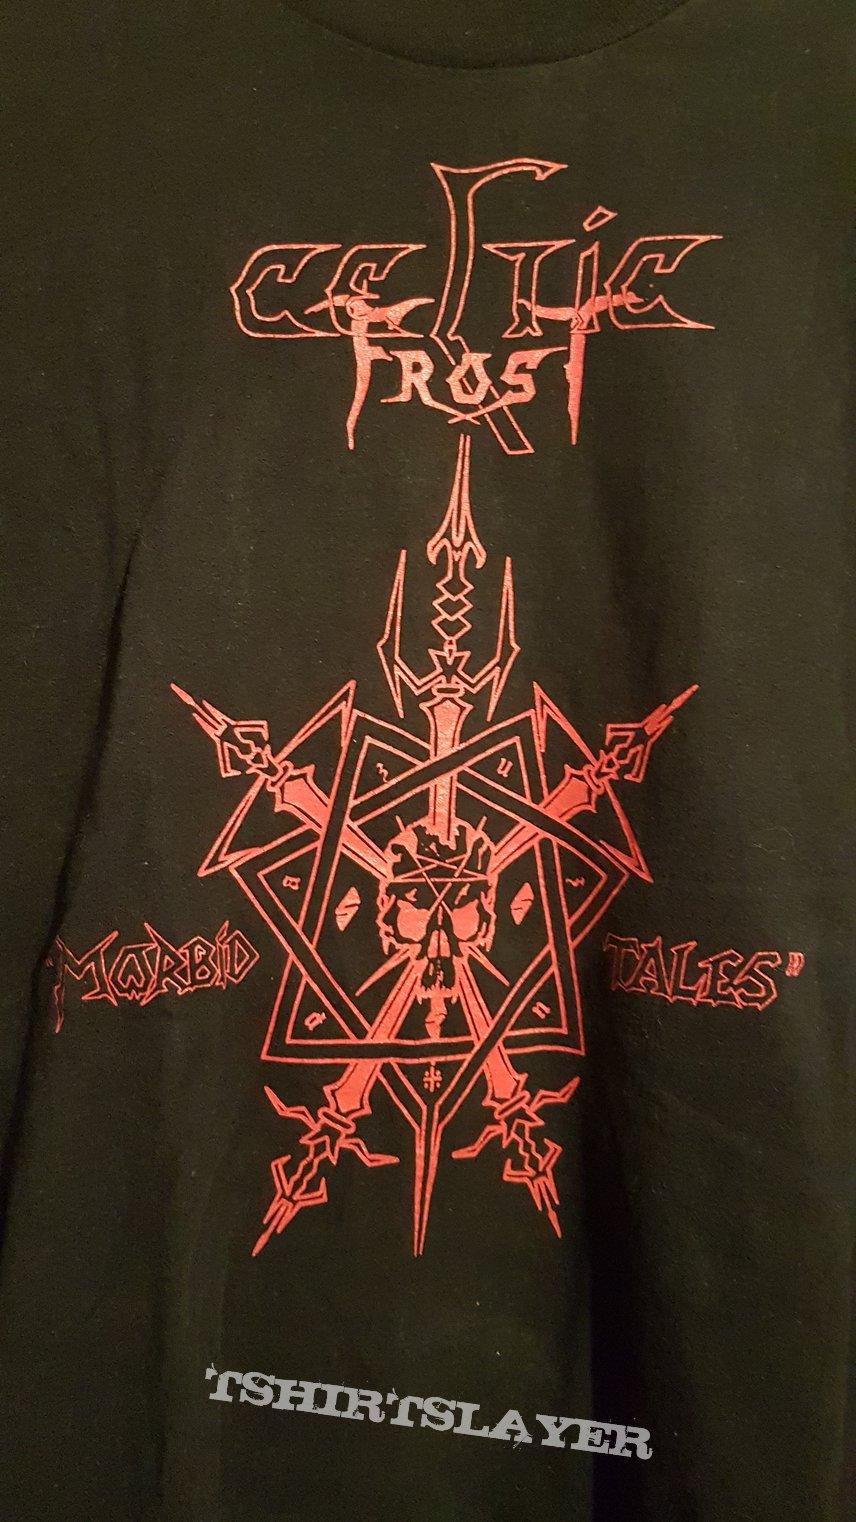 Celtic Frost Morbid Tales TS